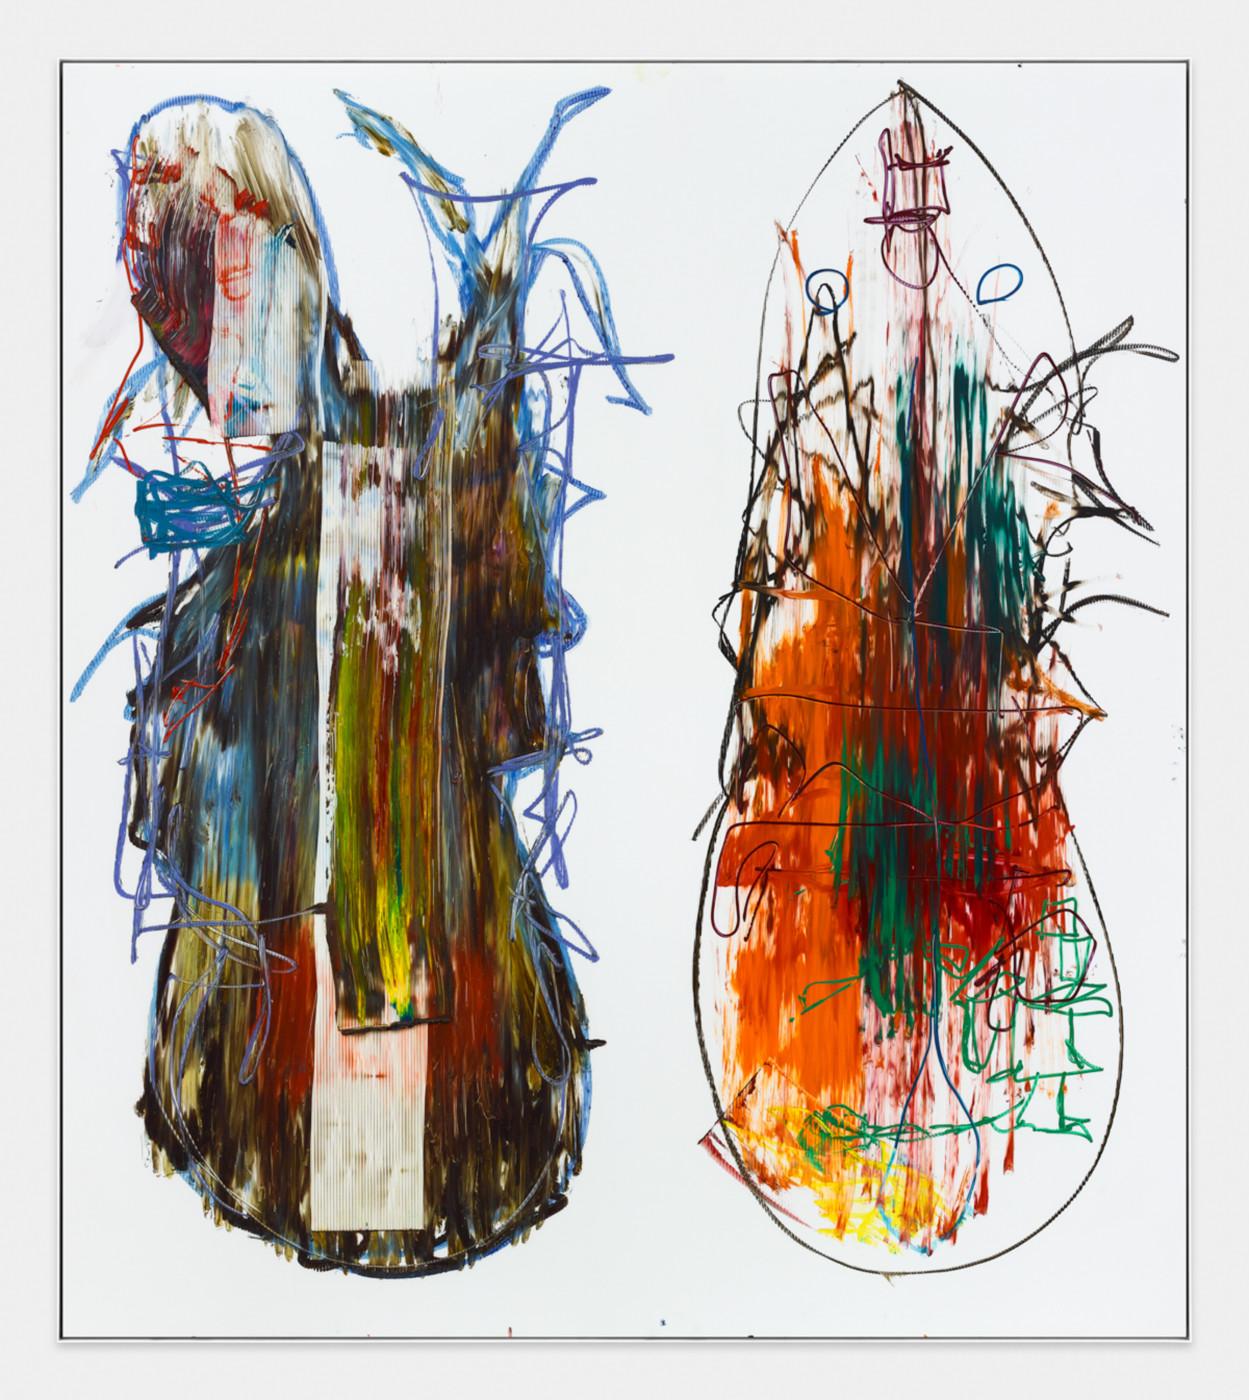 AARON  GARBER-MAIKOVSKA  DAUGHTER DUO 6 , 2019 Oil on fluted polyboard 231.7 × 205.7 cm / 91.25 × 80.9 in - High Art Gallery Paris